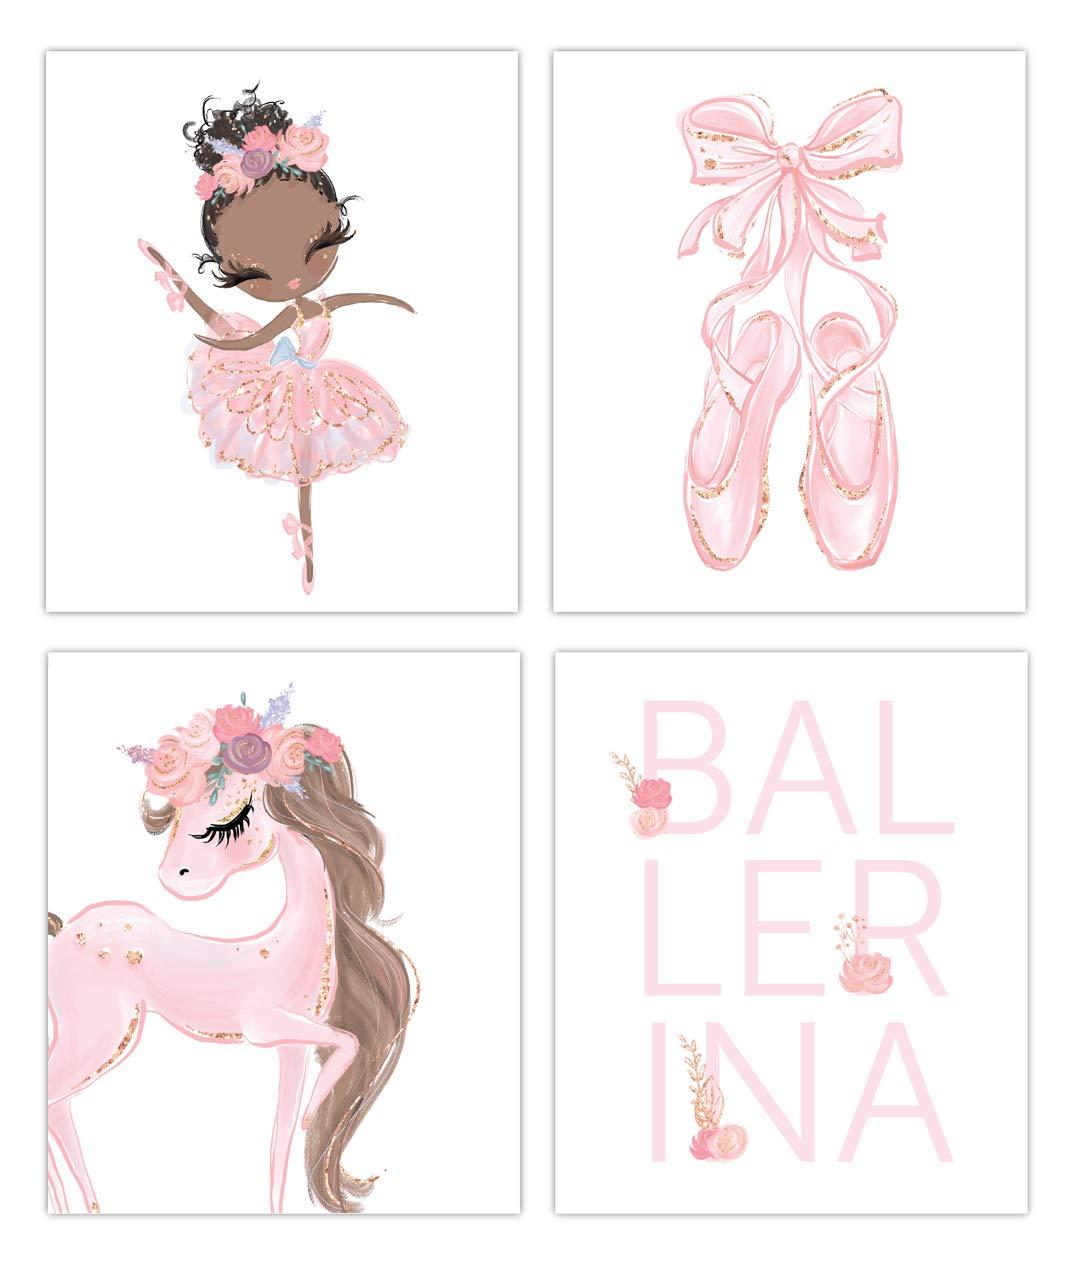 Designs by Maria Inc. Black Ballerina Prints Set of 4 (Unframed) Nursery Decor Art (8x10) (Option 1)